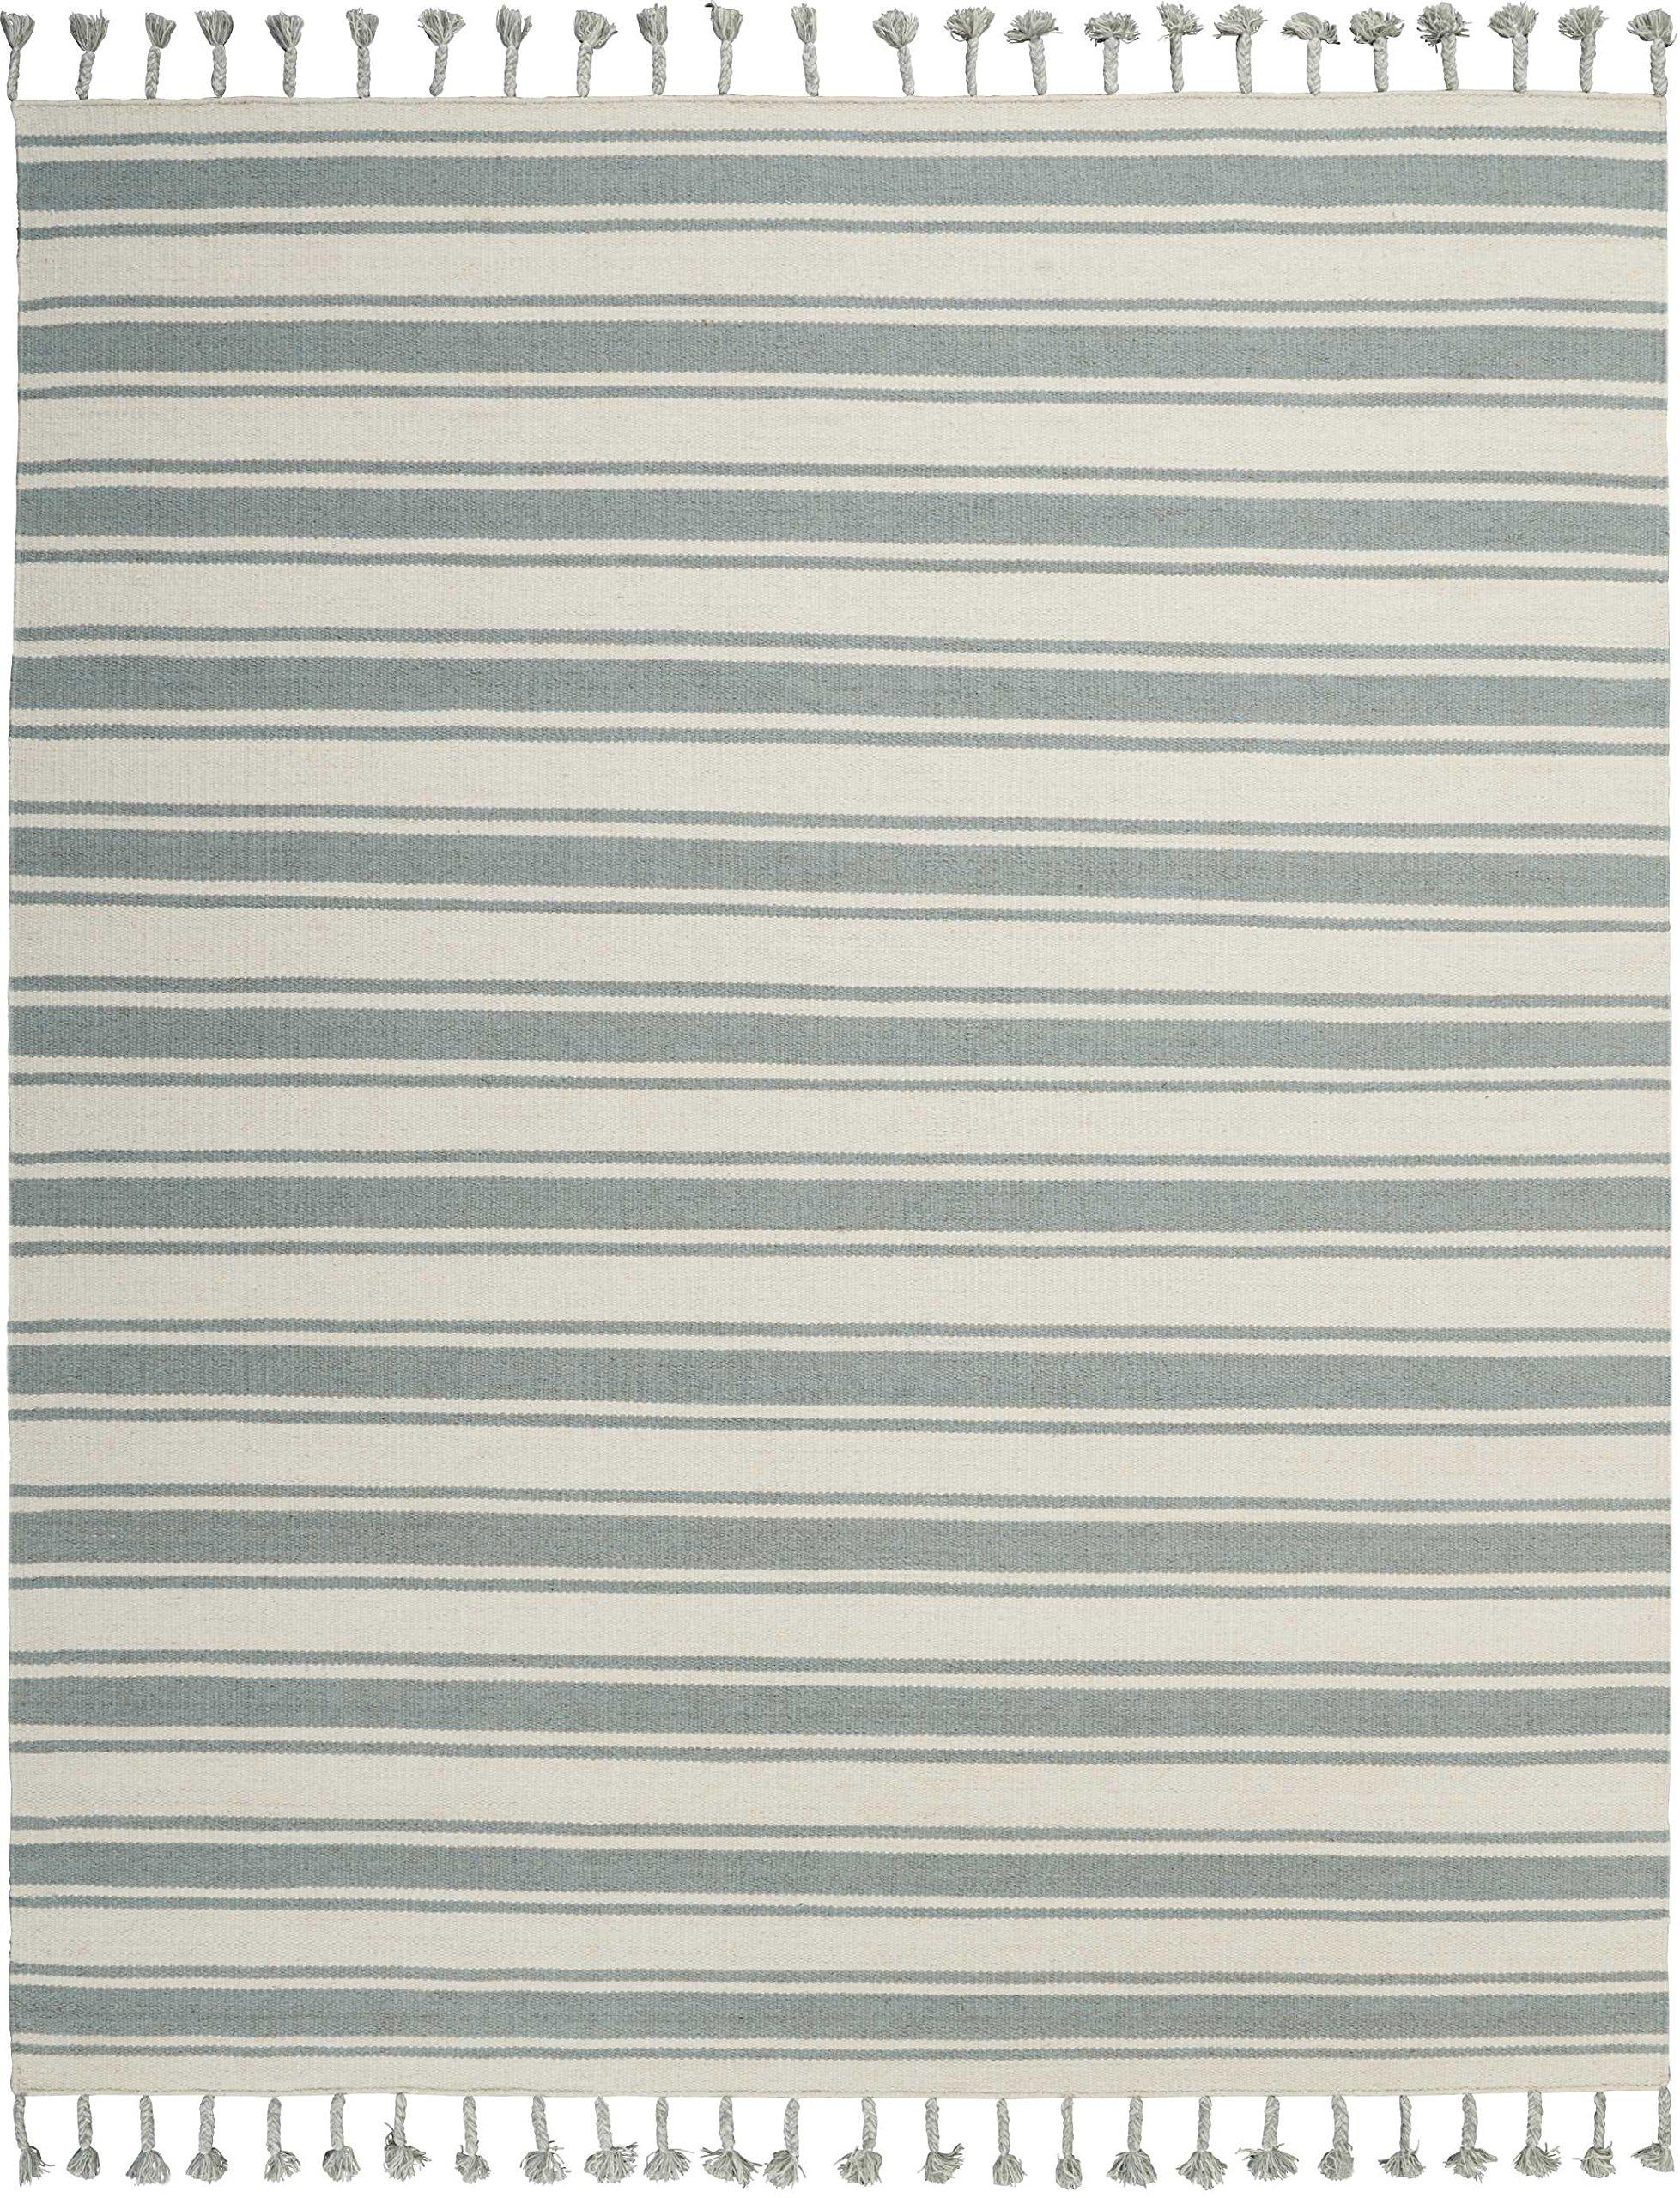 Nourison SLN01 Solano Collection Modern/Contemporary Area Rug, 8' x 10'6'', Ivory/Spa